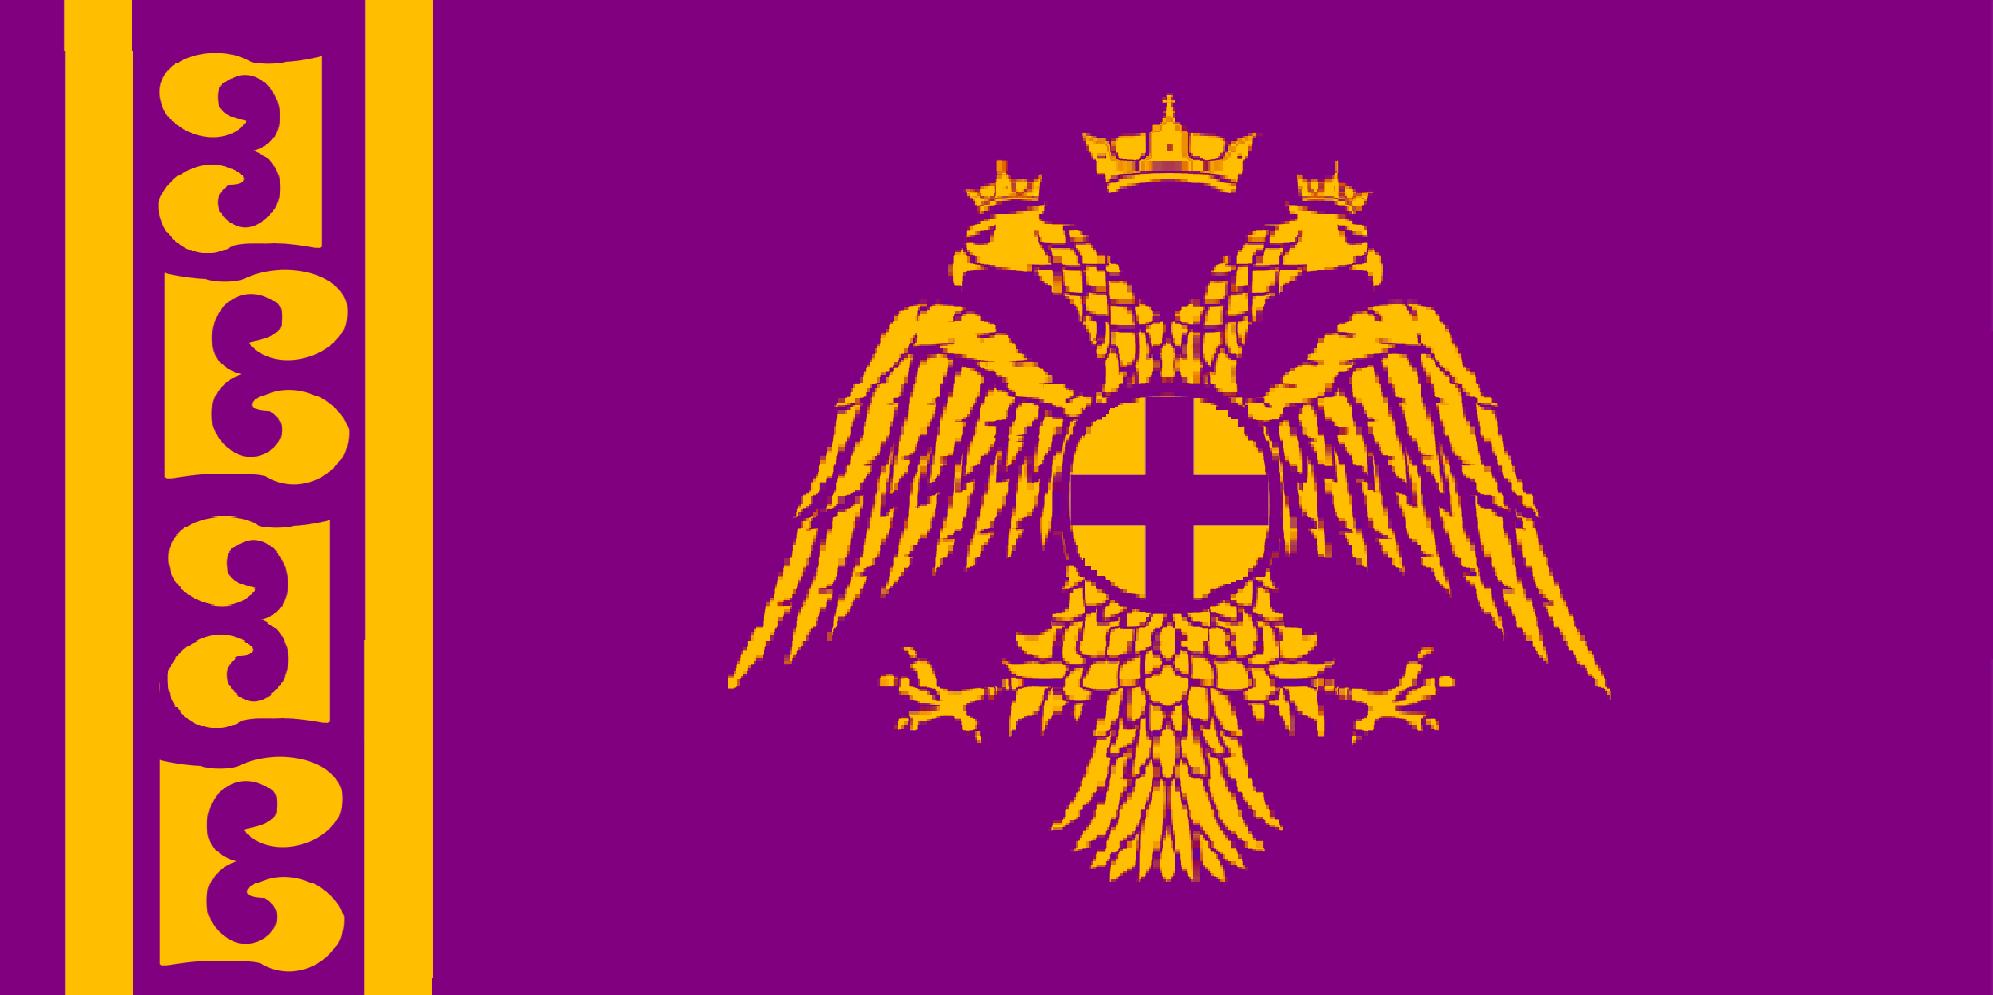 spqr wallpaper purple - photo #35